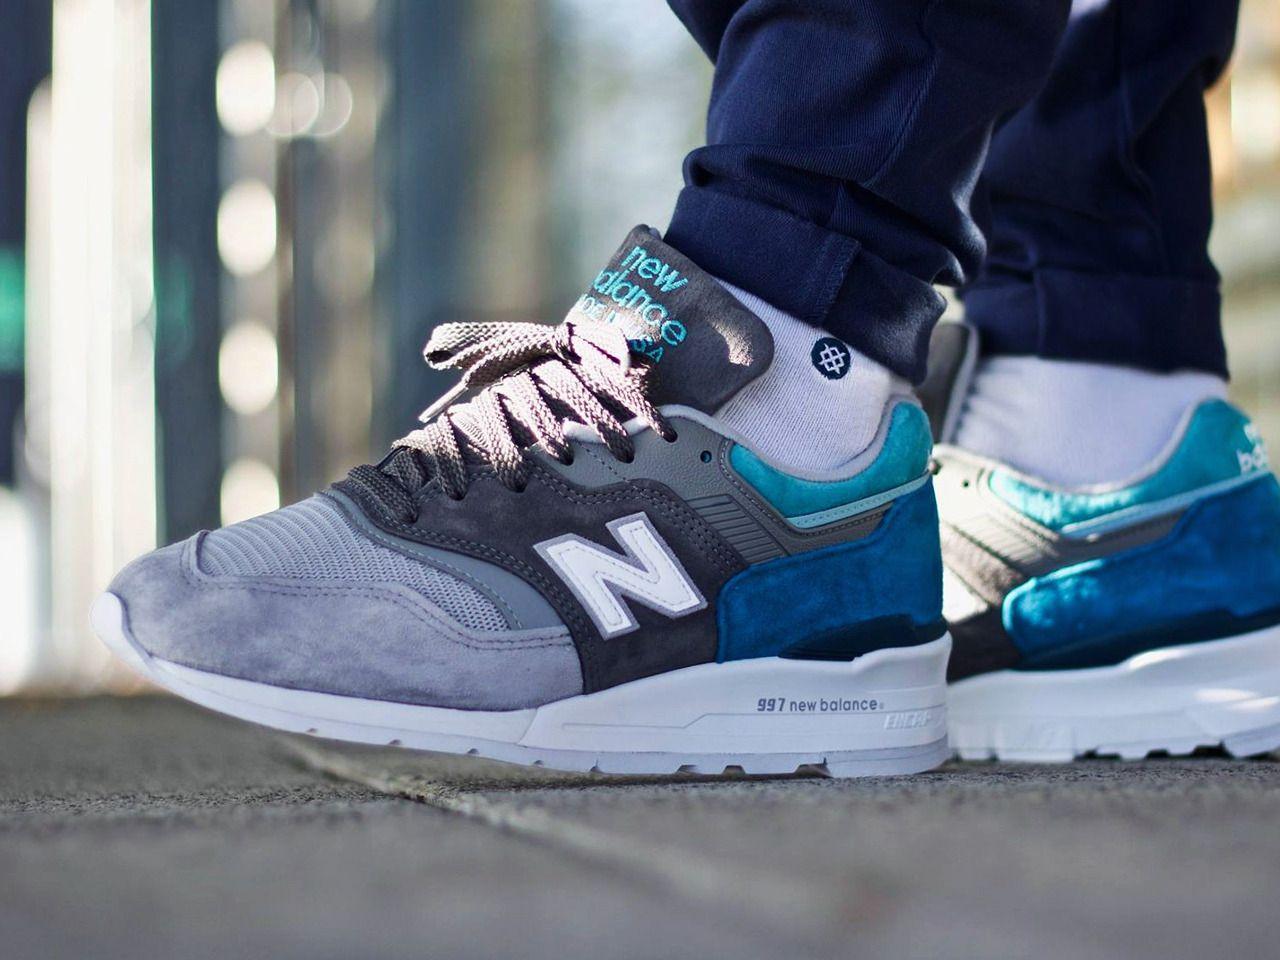 New Balance 997CA - 2017 (by Fred Adam) | Sneaker, Turnschuhe, Schuhe